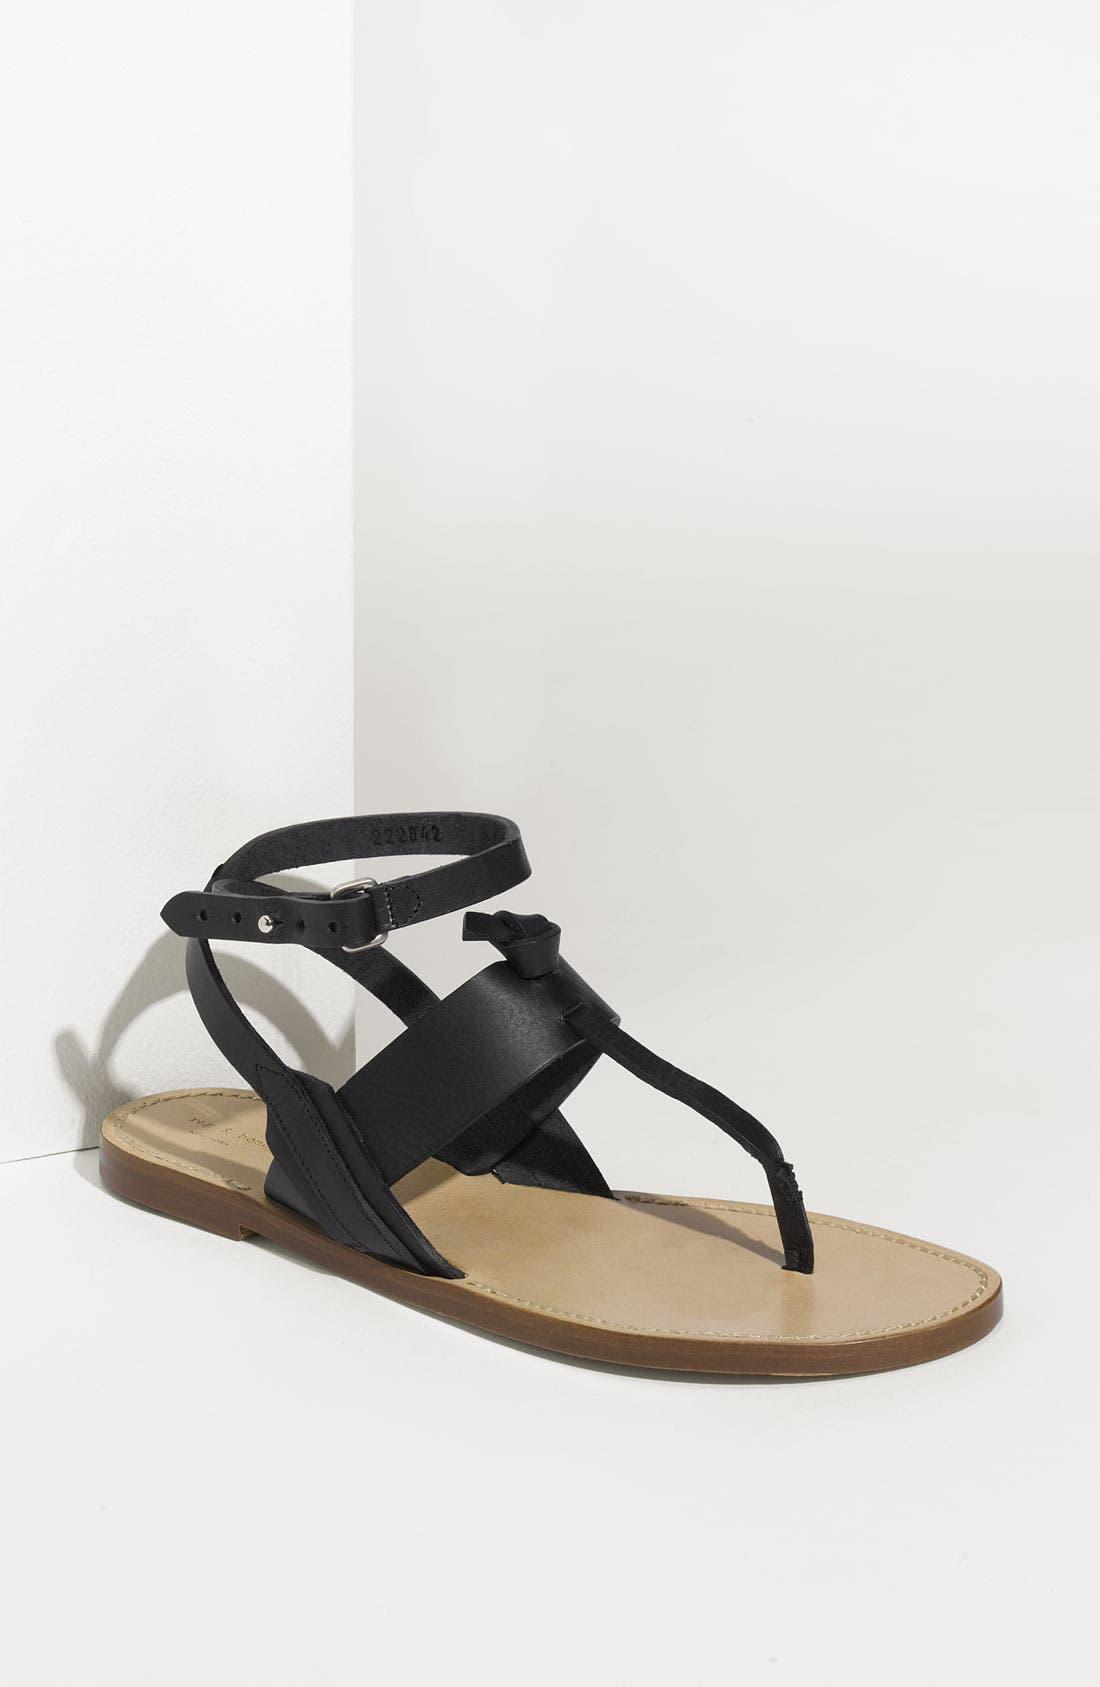 Alternate Image 1 Selected - rag & bone 'Sigrid' Sandal